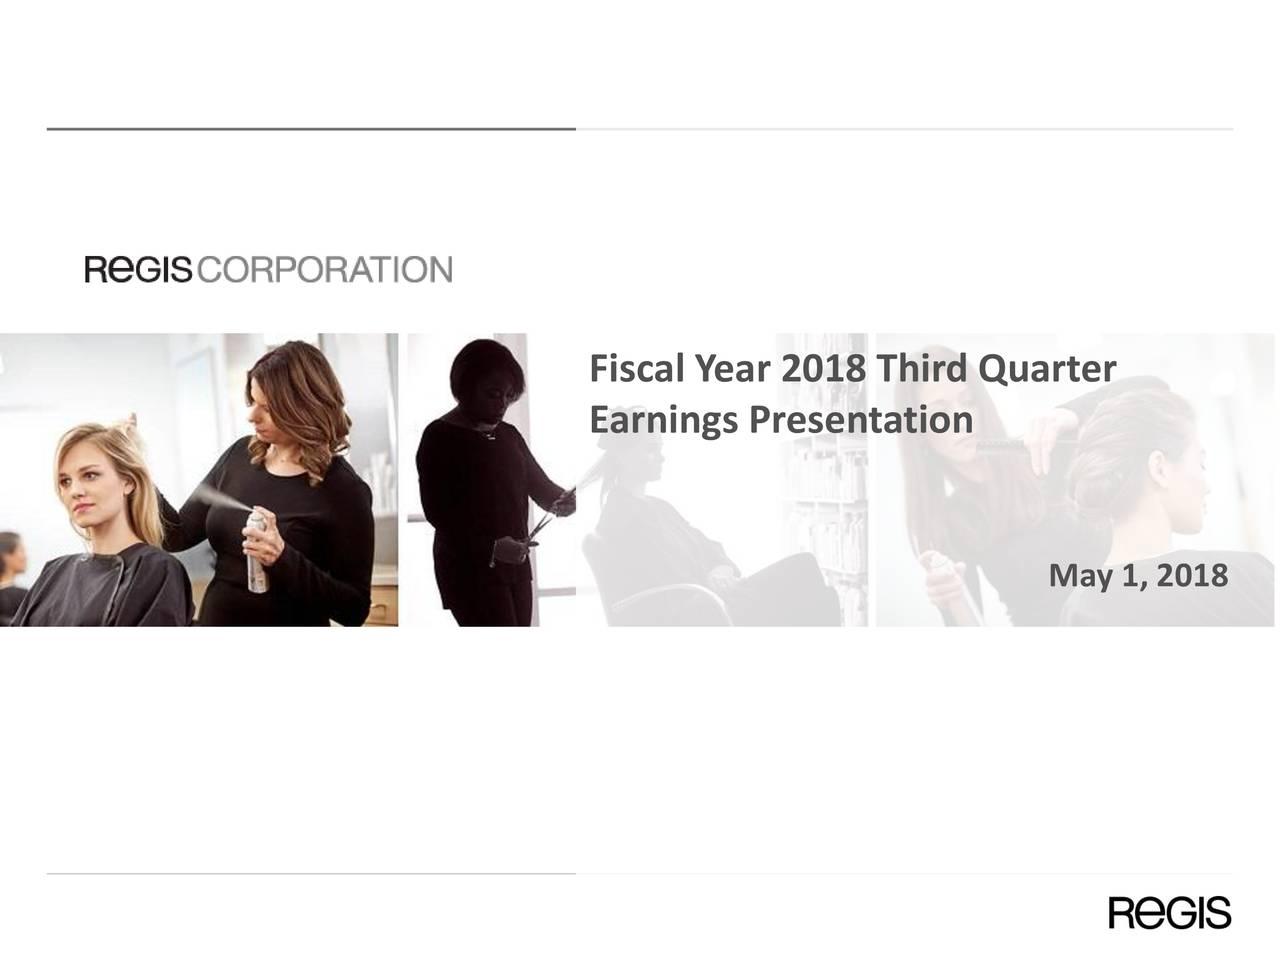 earnings presentation may 1